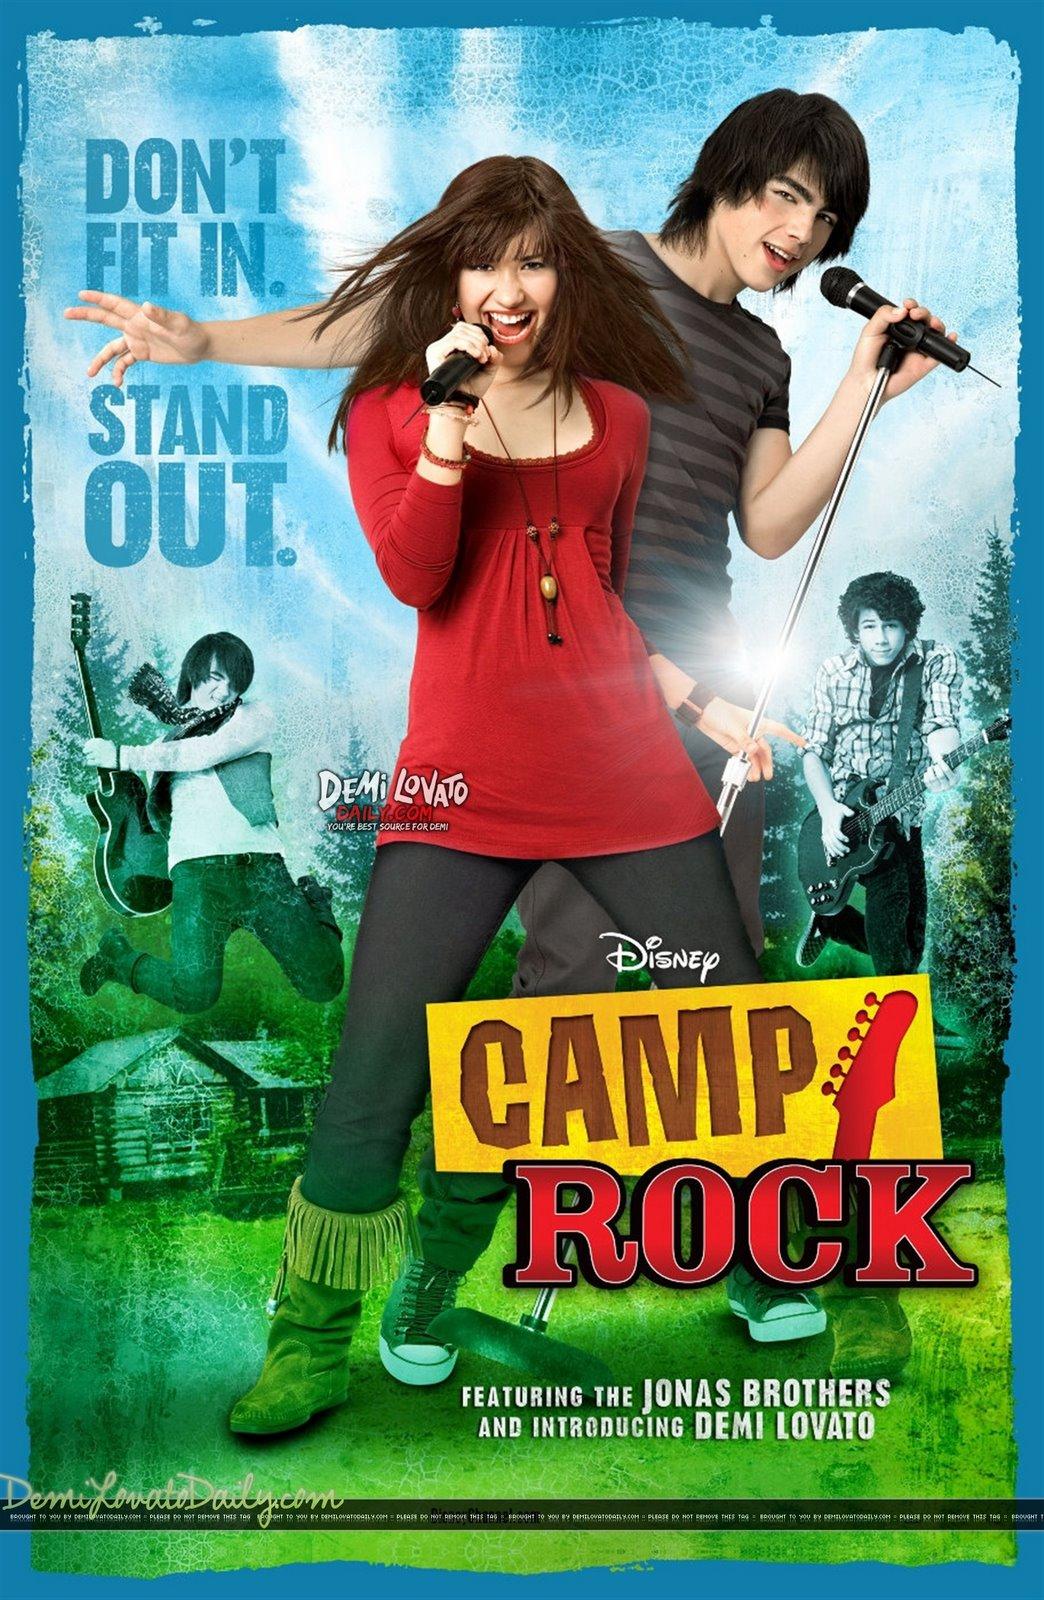 Disney Soul: Camp Rock